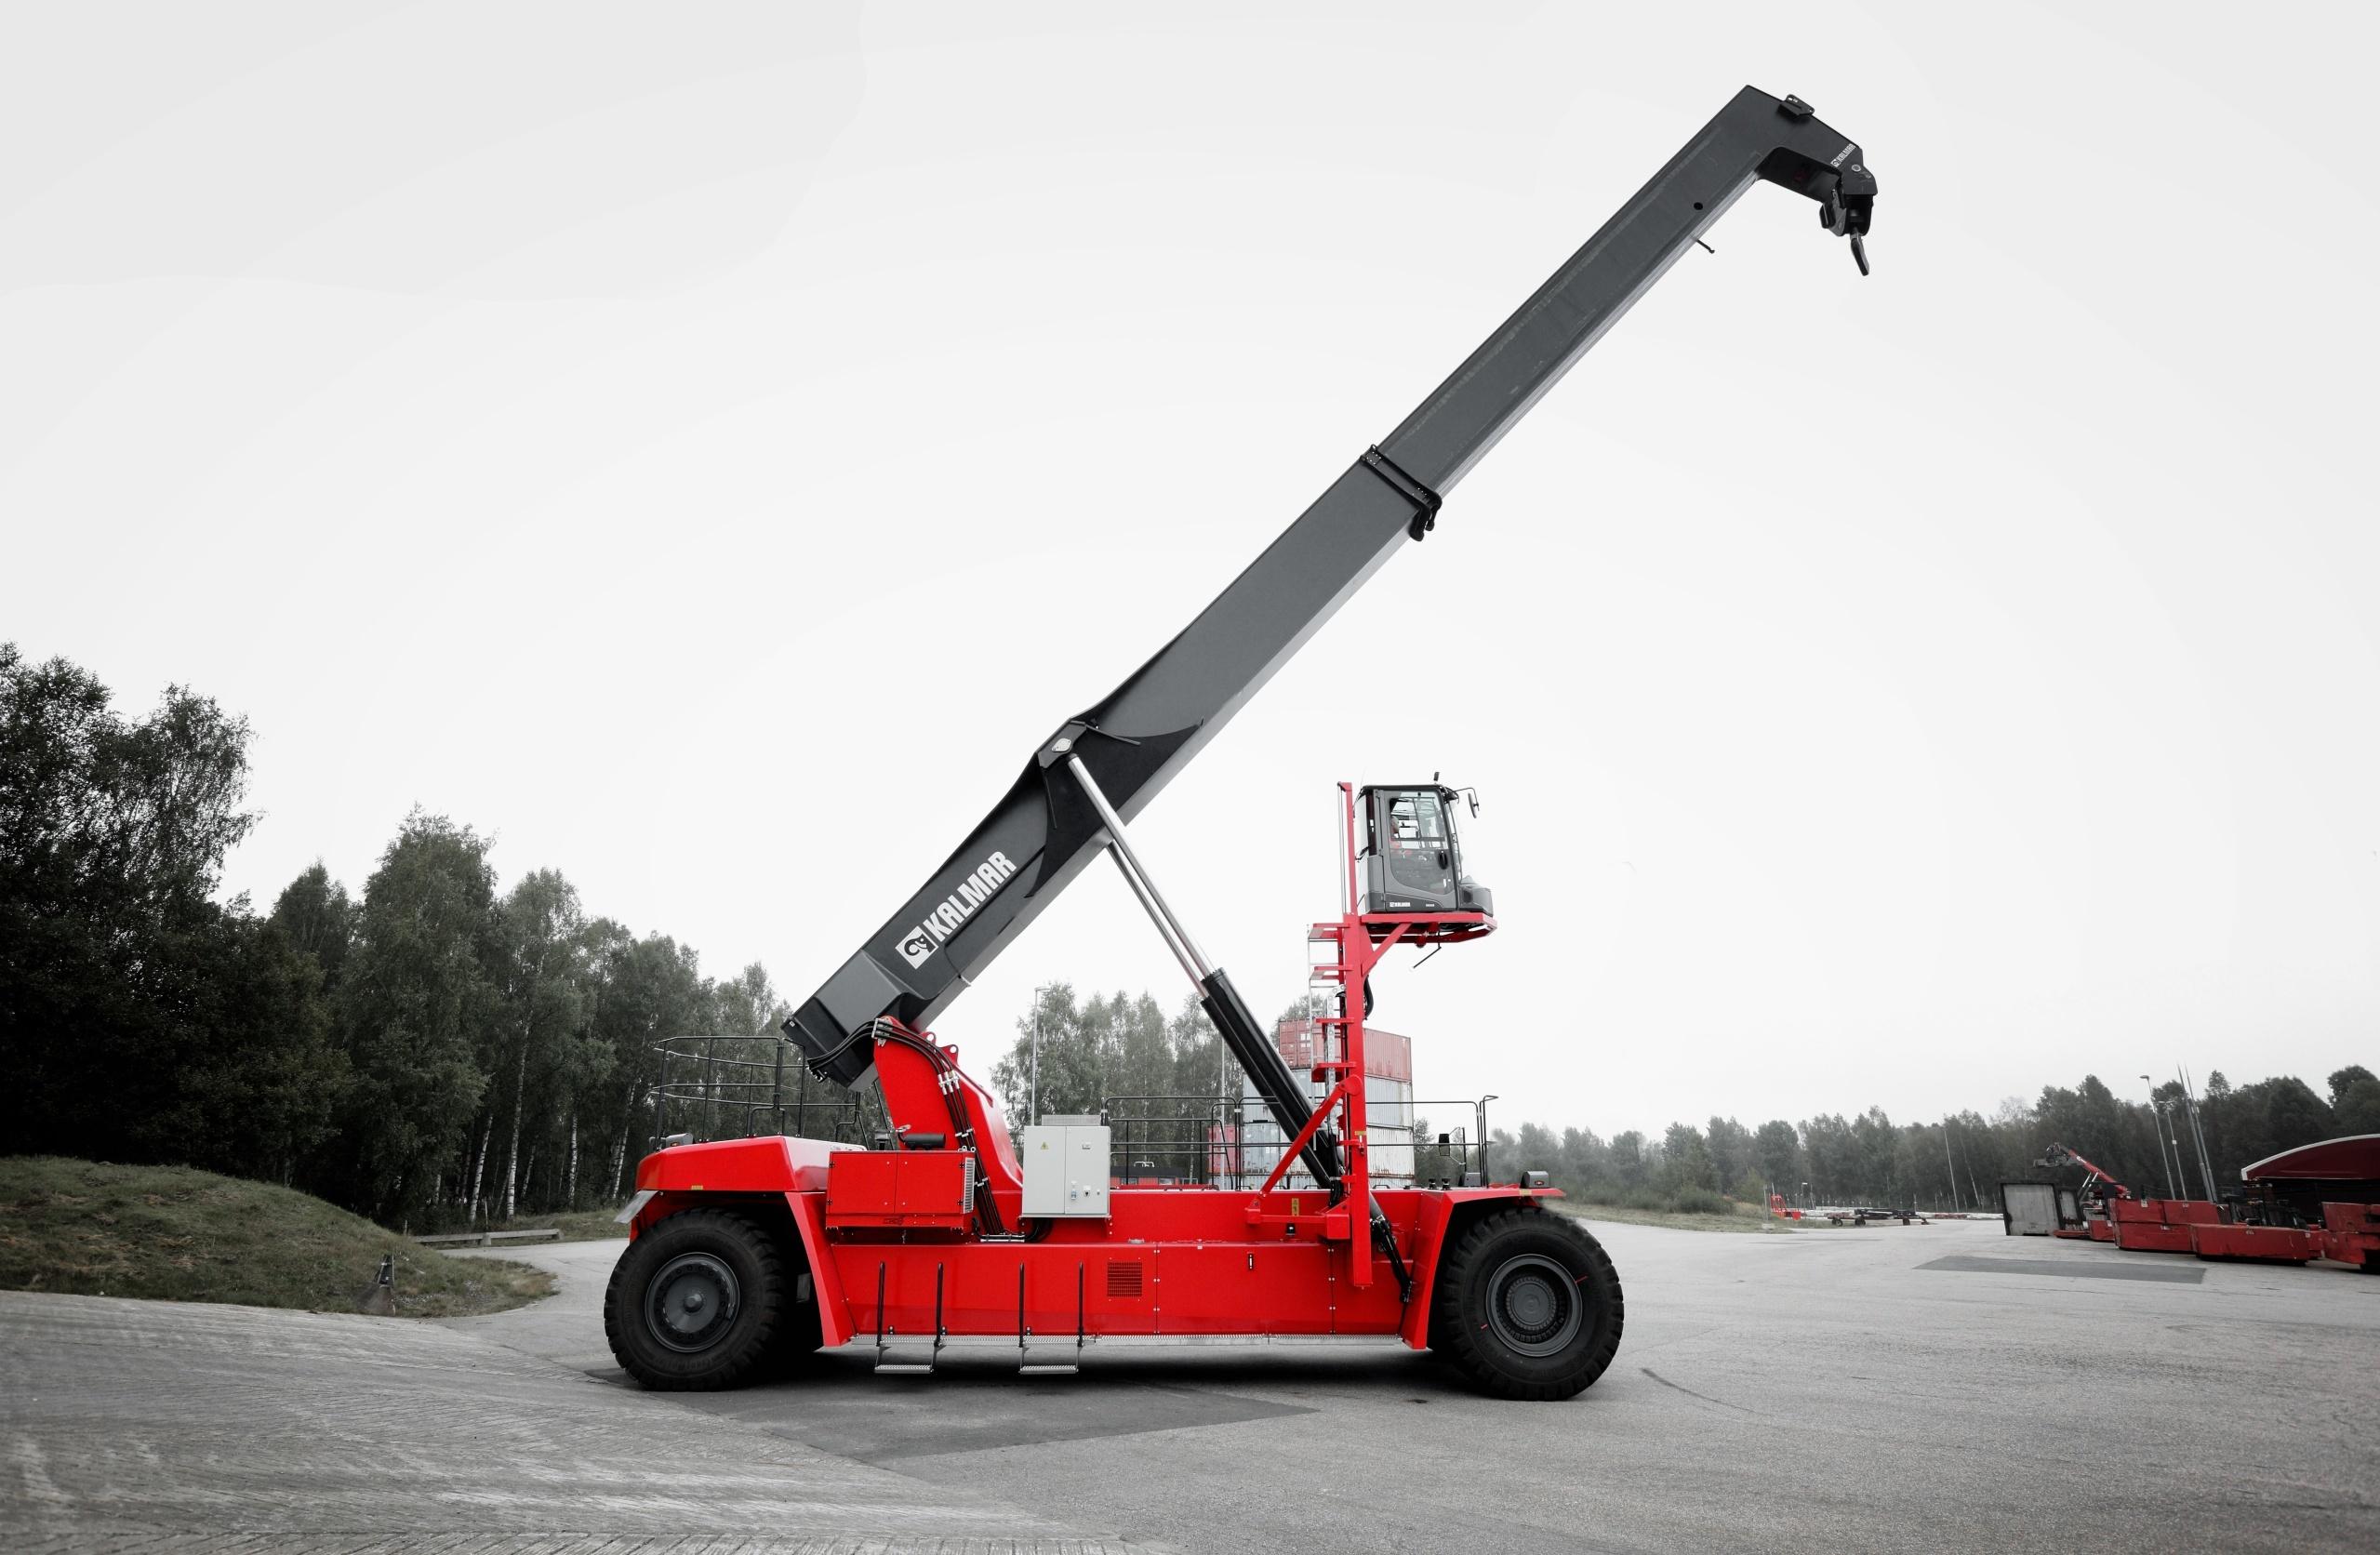 kalmar receives double order for the new super gloria reachstacker rh kalmarglobal com kalmar reach stacker operator manual kalmar reach stacker operator manual